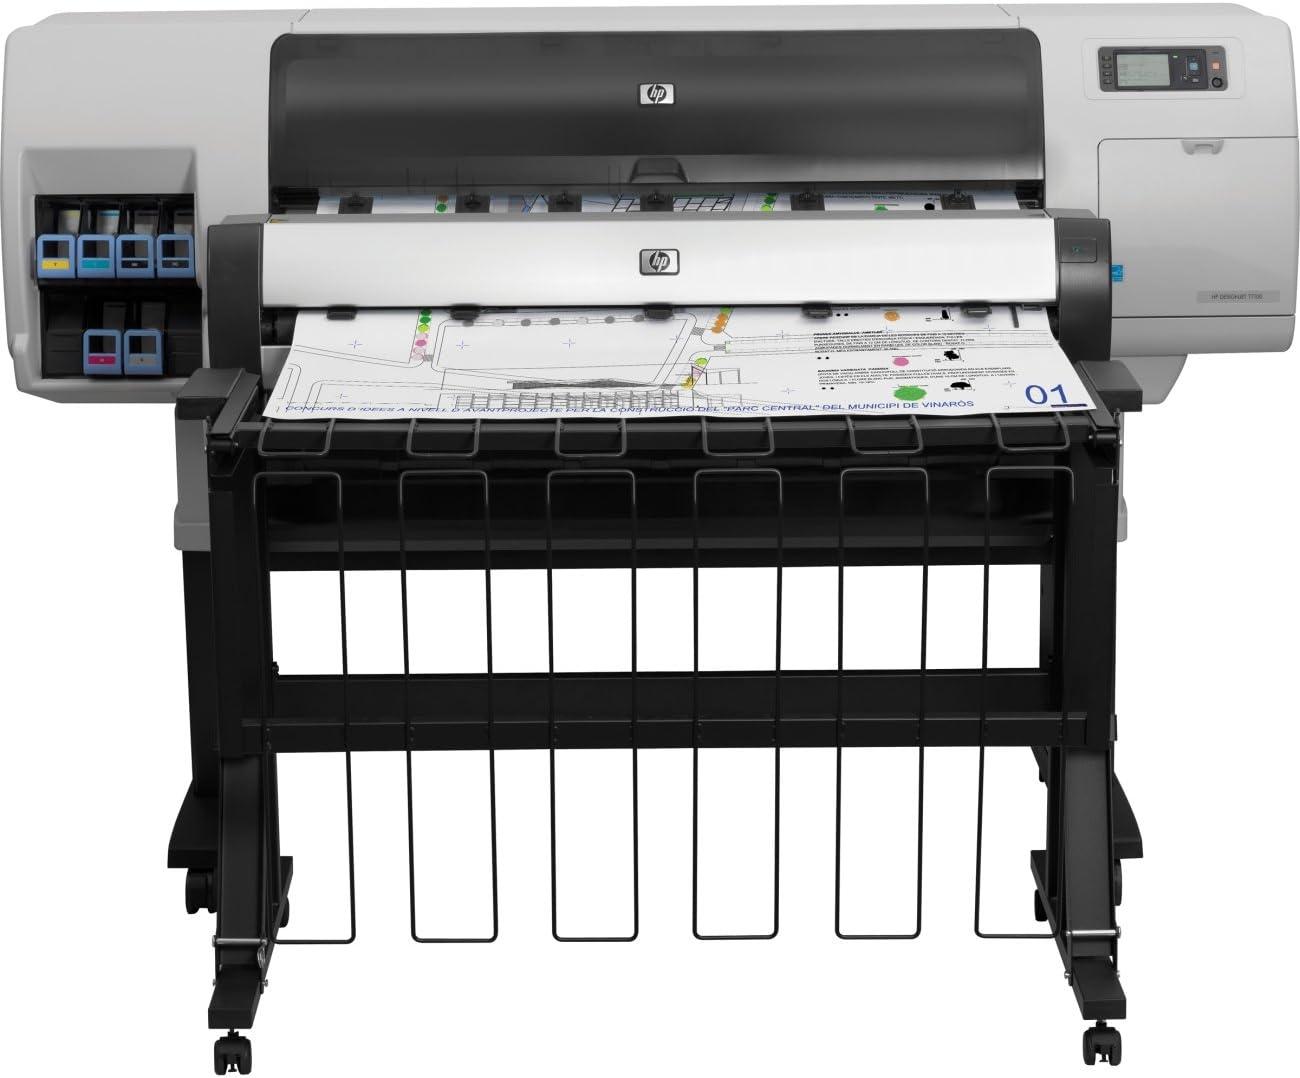 HP Designjet T7100 Printer - Impresora de gran formato (165 pph, 2400 x 1200 DPI, Negro, Cian, Gris, Gris, Magenta, Amarillo, 0,4 mm, 5 mm, 775ml/400ml): Amazon.es: Informática